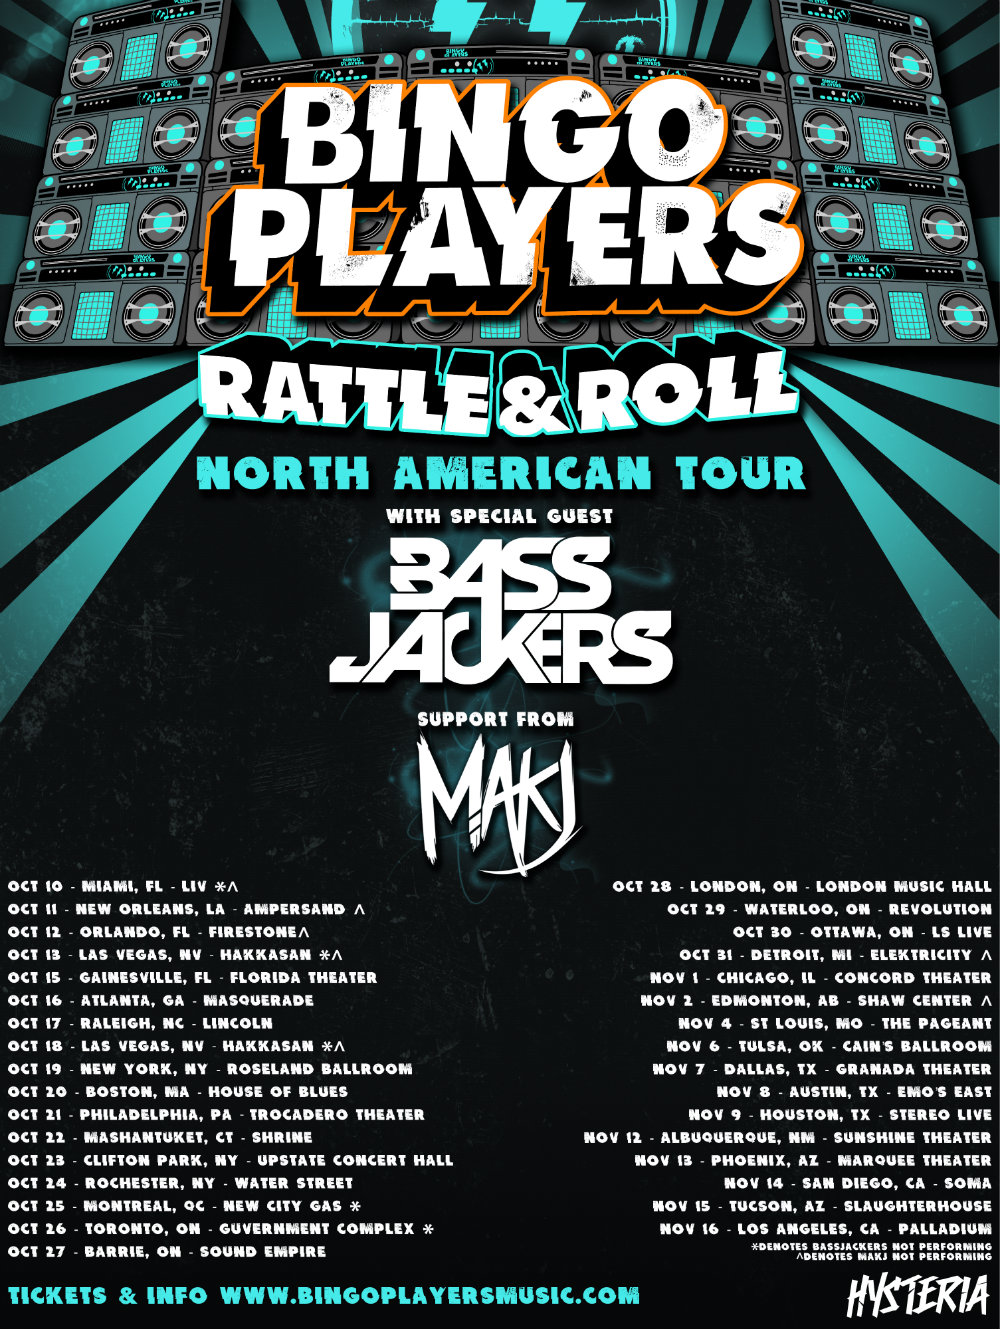 Bingo Players north American Tour